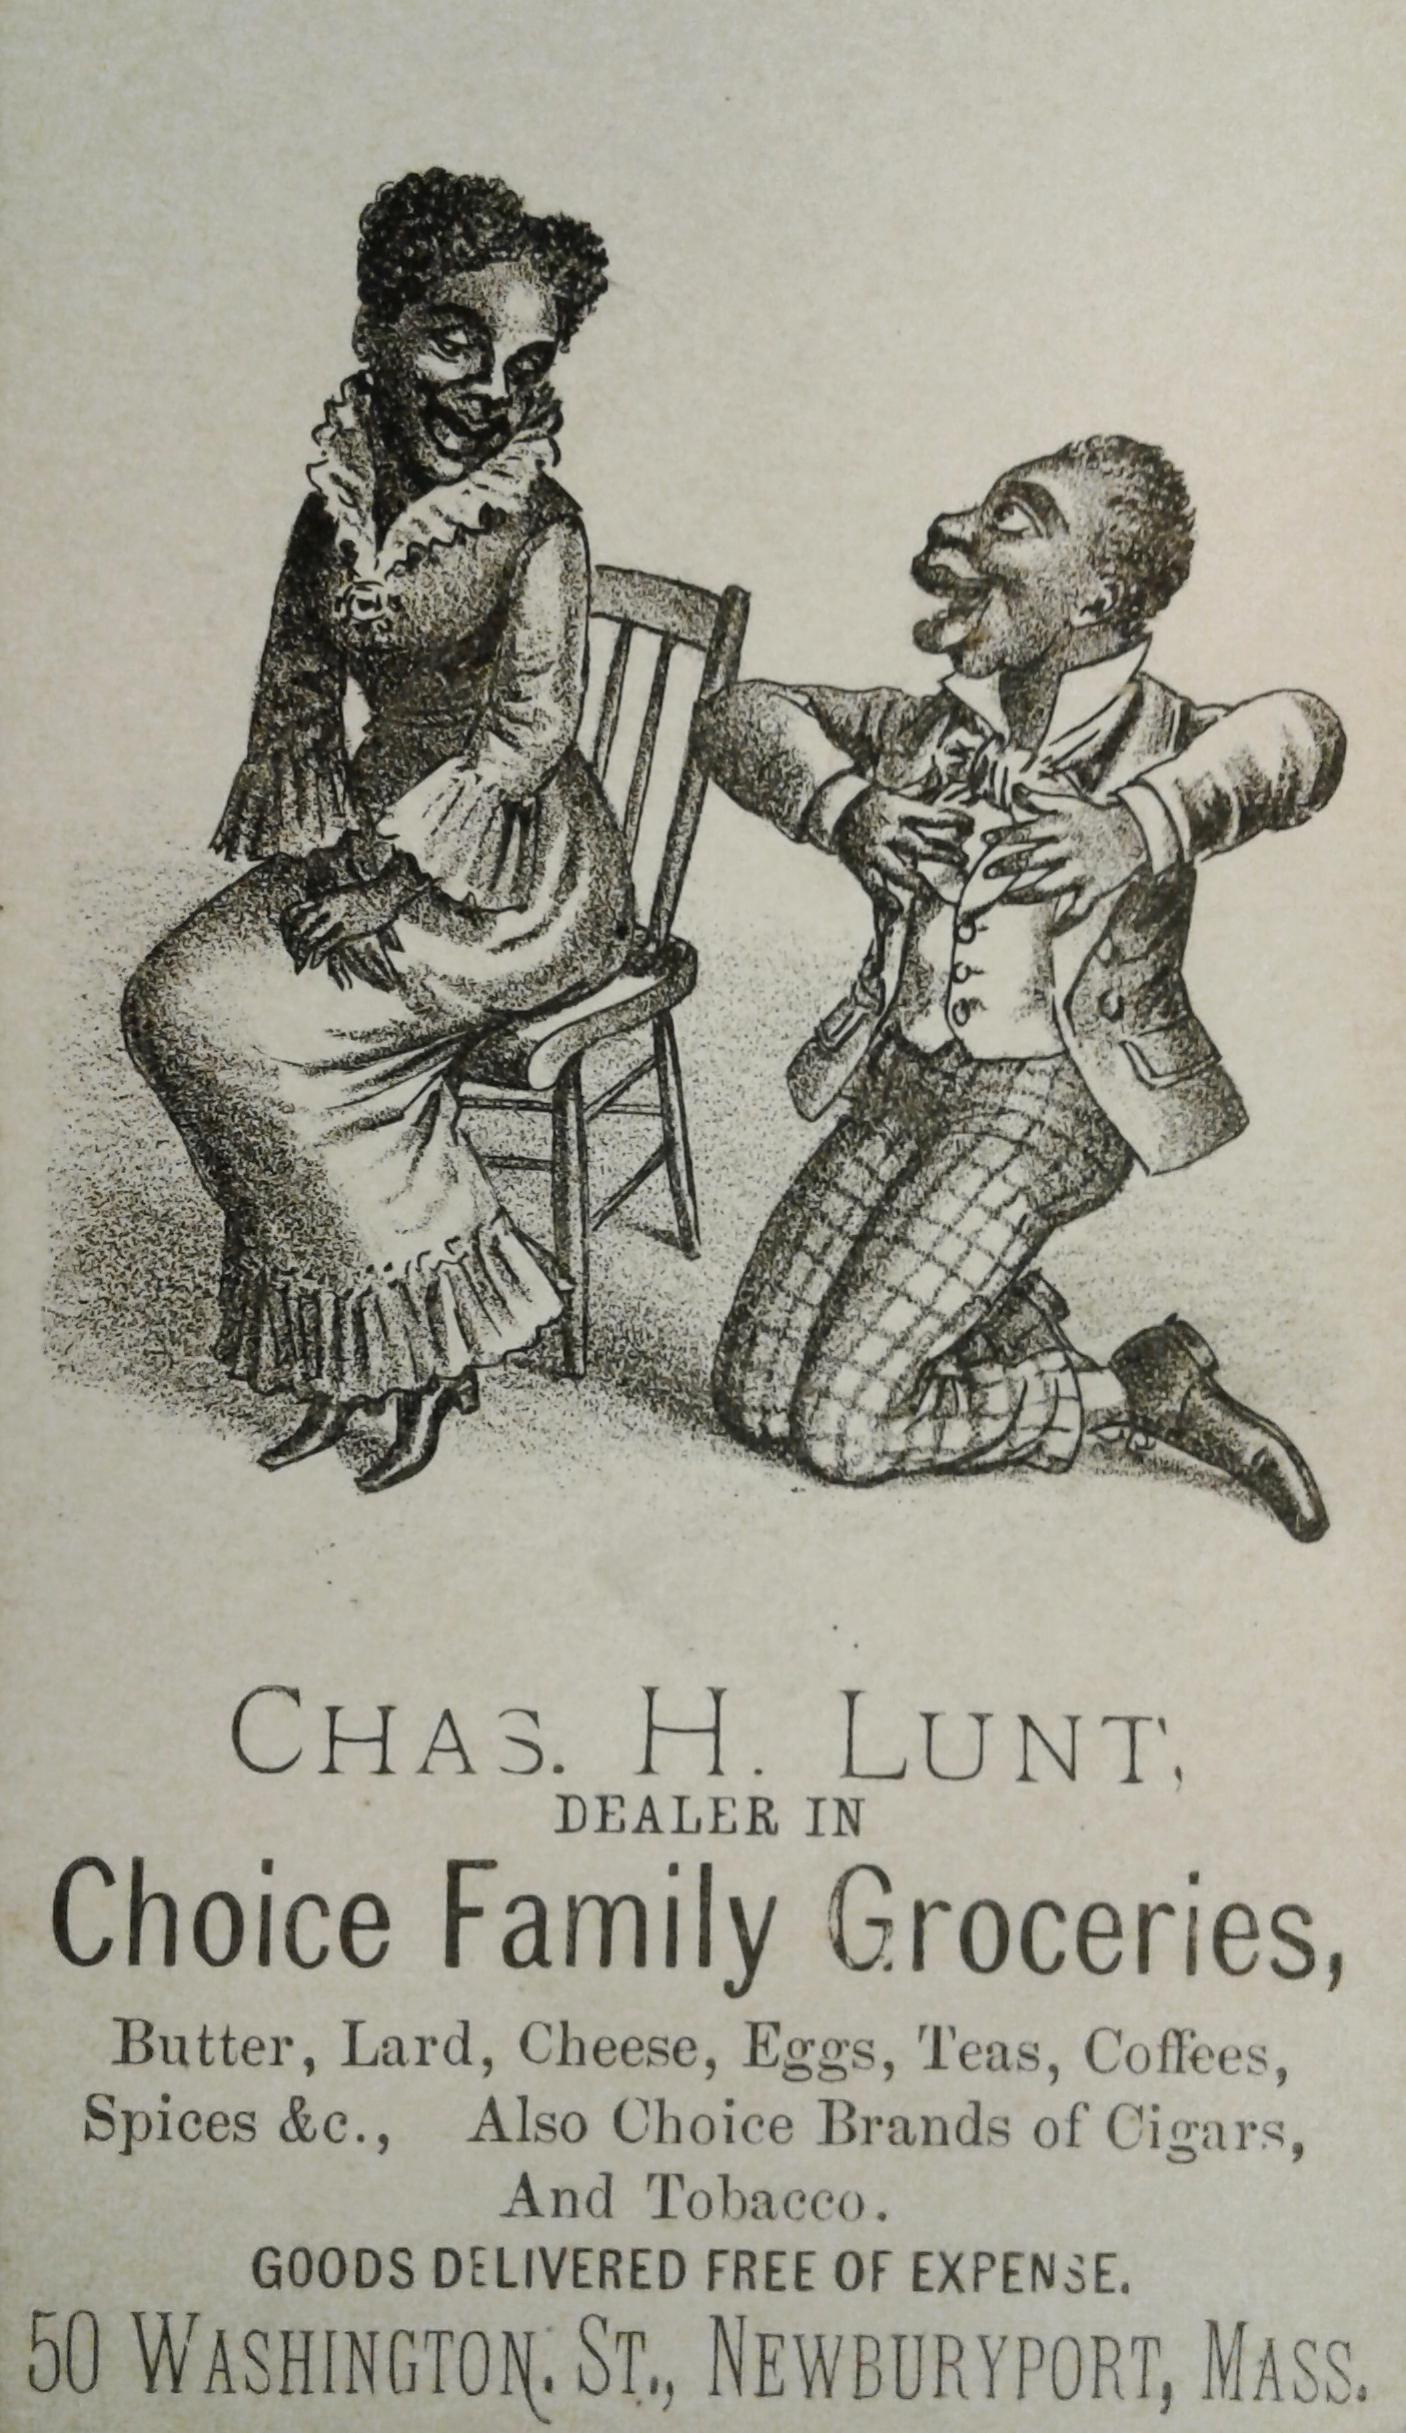 """Choice Family Groceries"" Business Card, Newburyport Public Library Archival Center, Newburyport, MA."